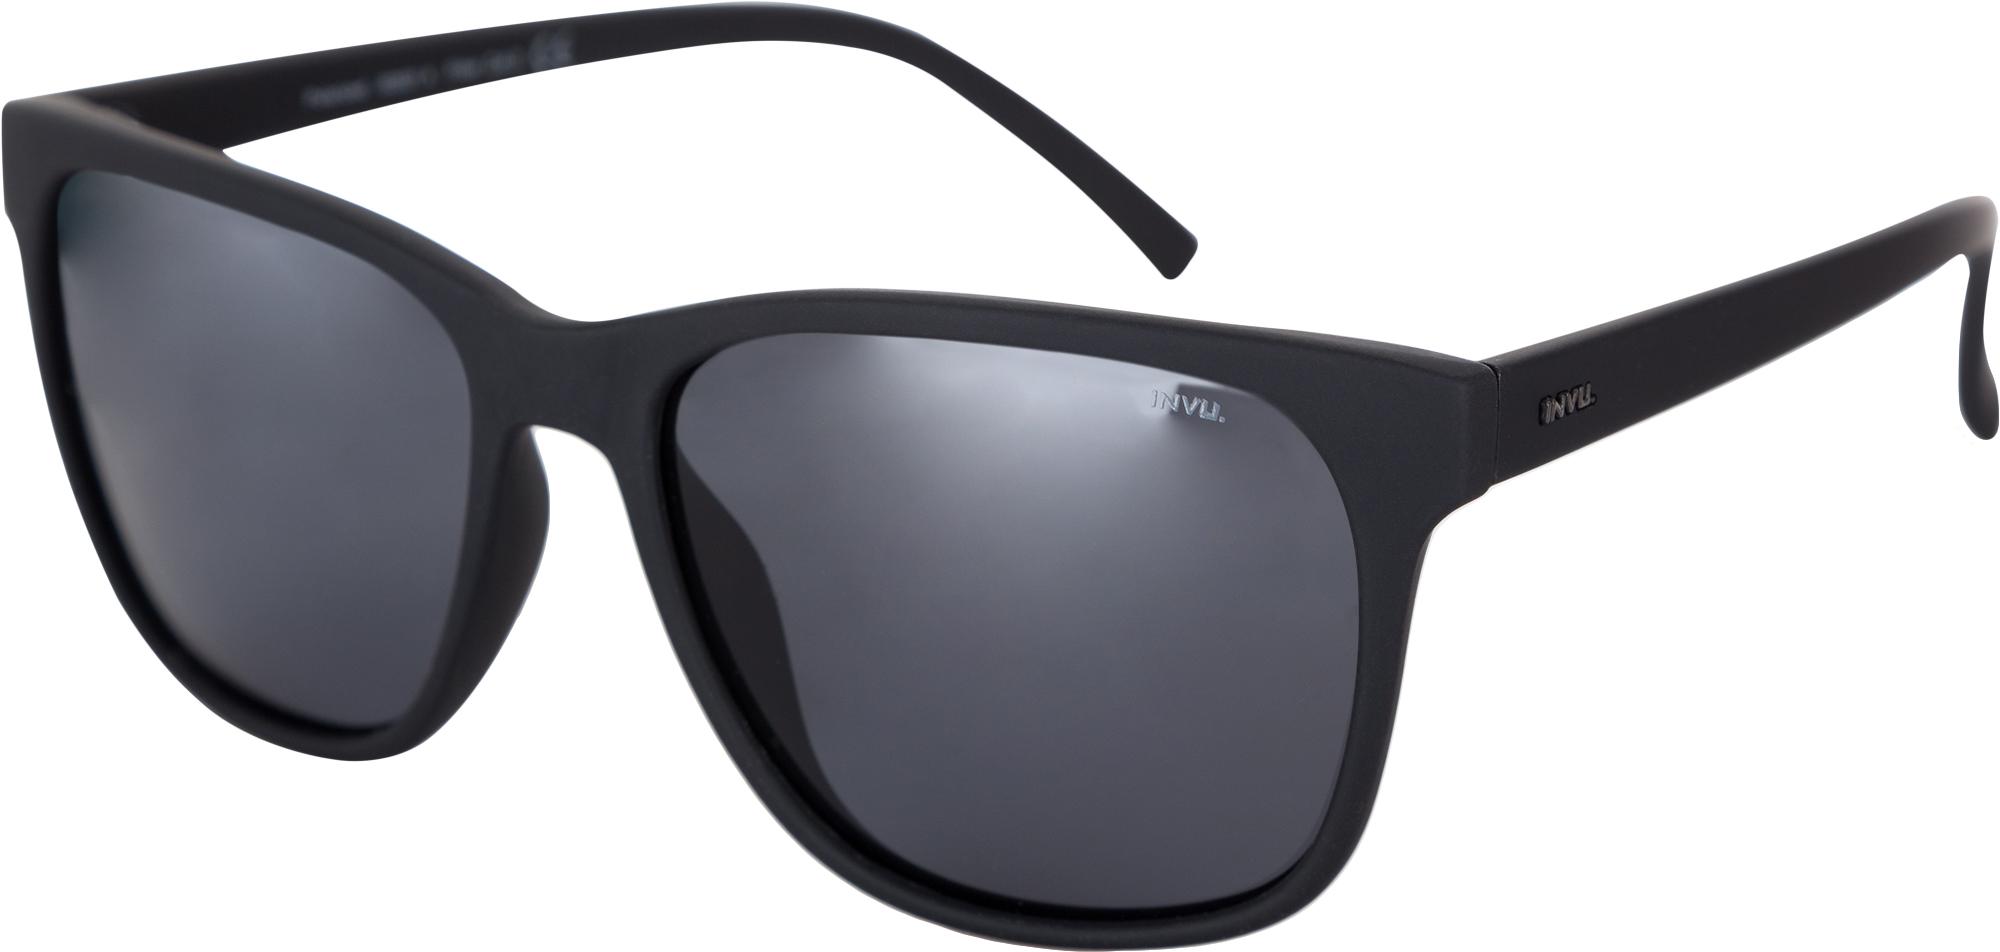 Invu Солнцезащитные очки мужские Invu солнцезащитные очки bikkembergs очки солнцезащитные